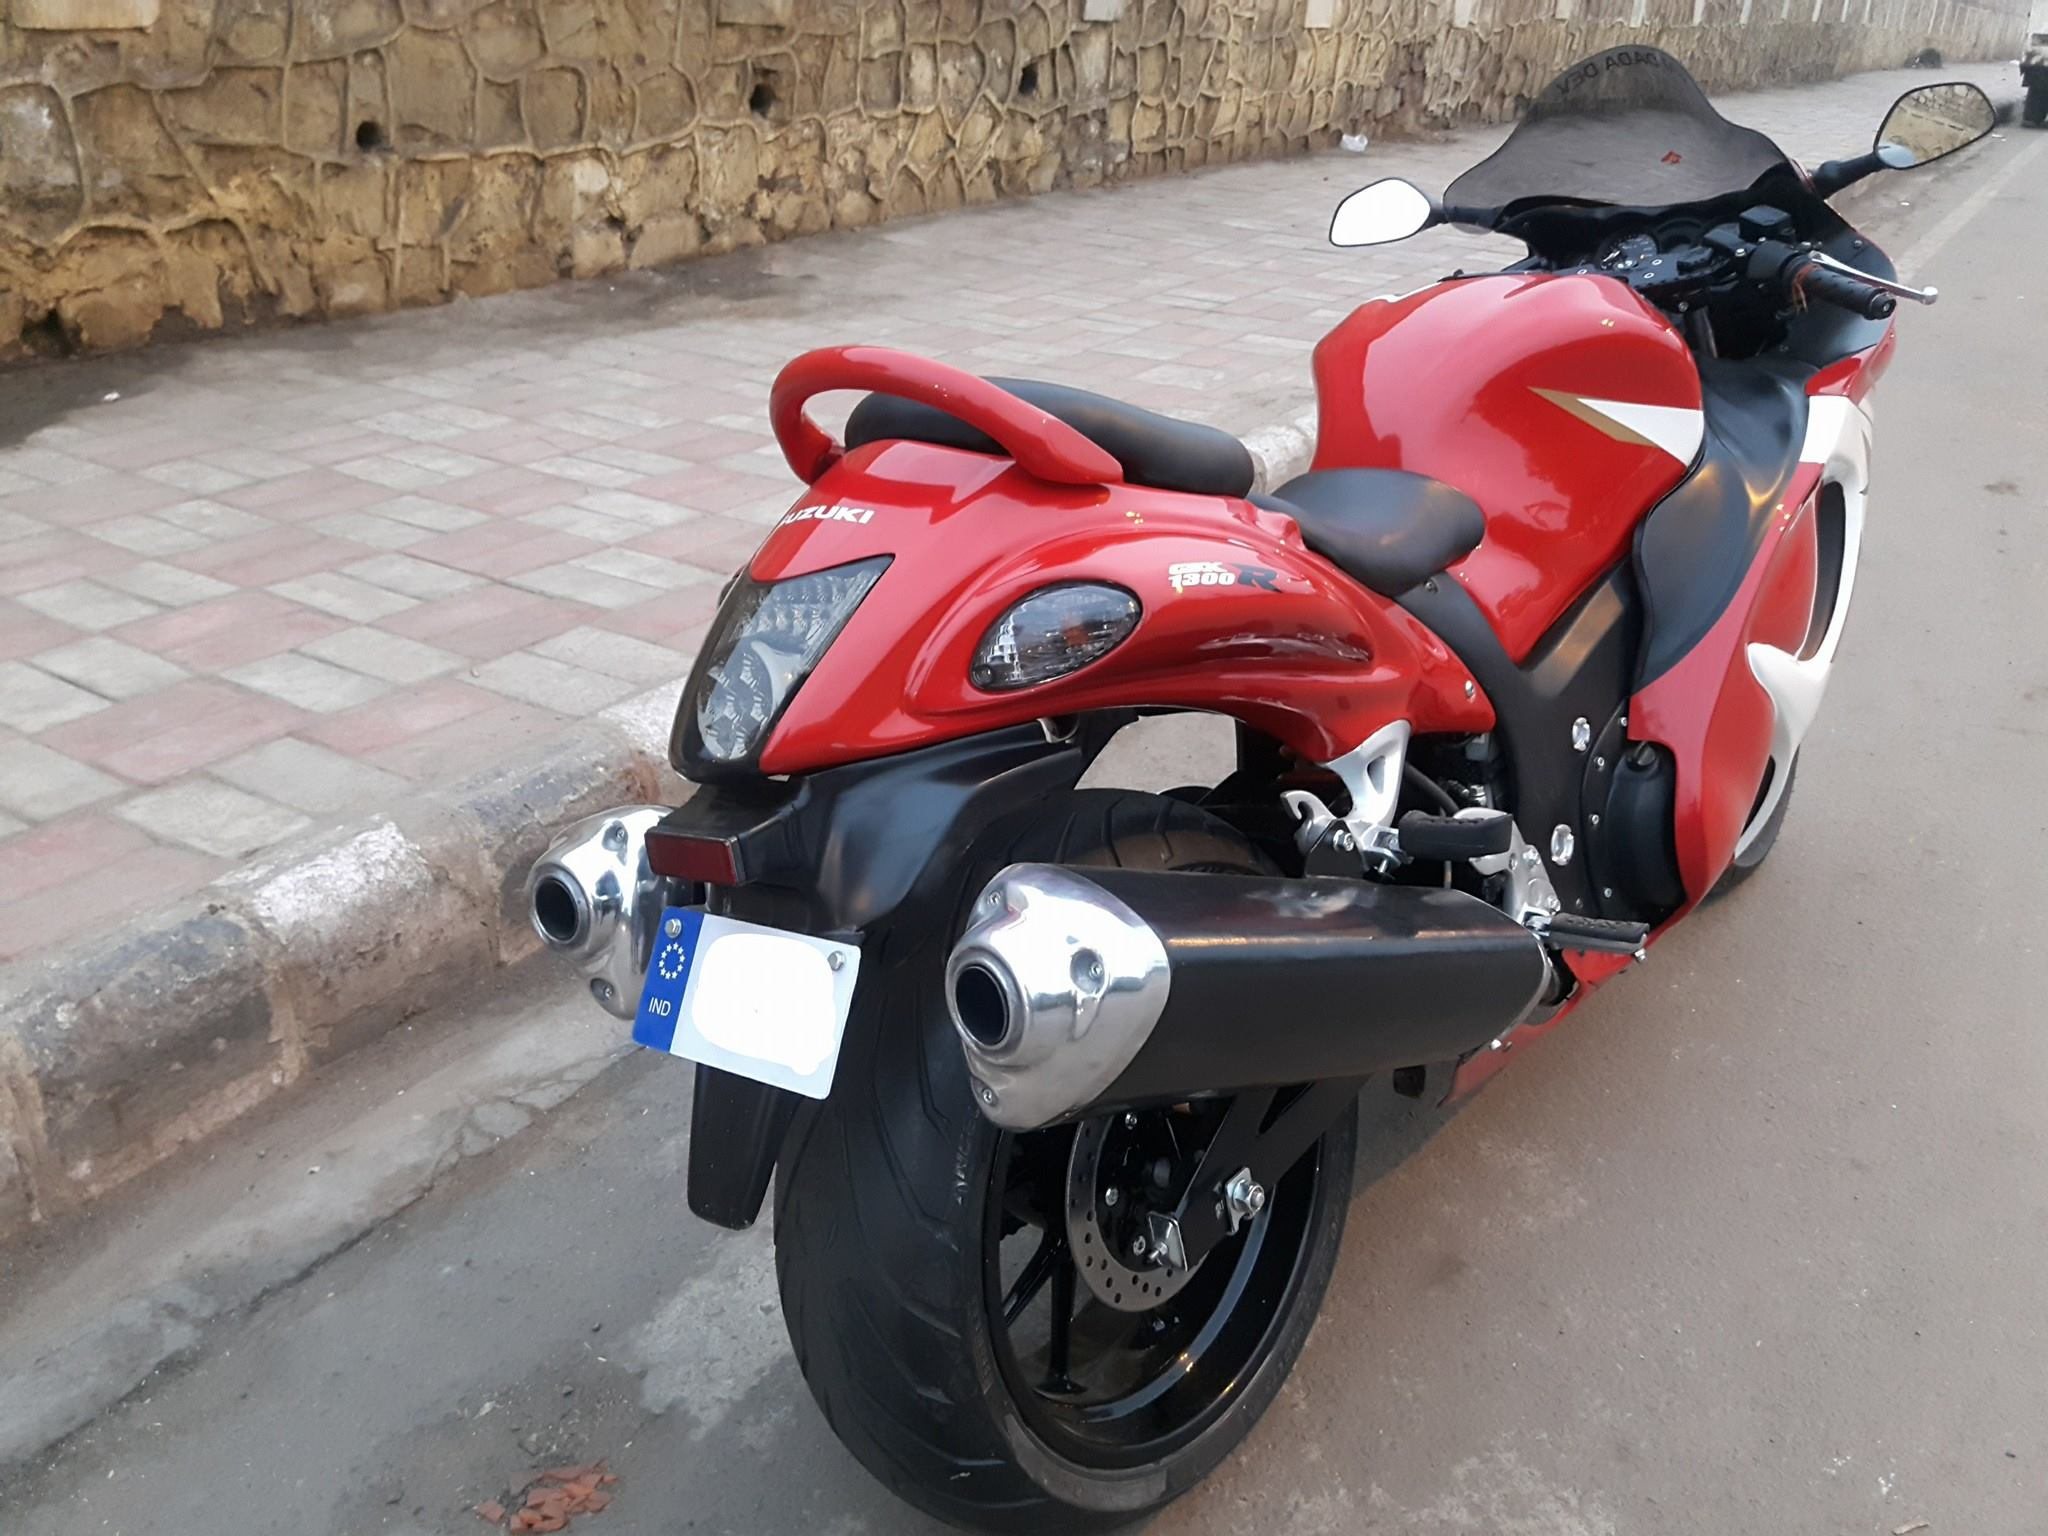 Suzuki debuts 2018 Hayabusa in India